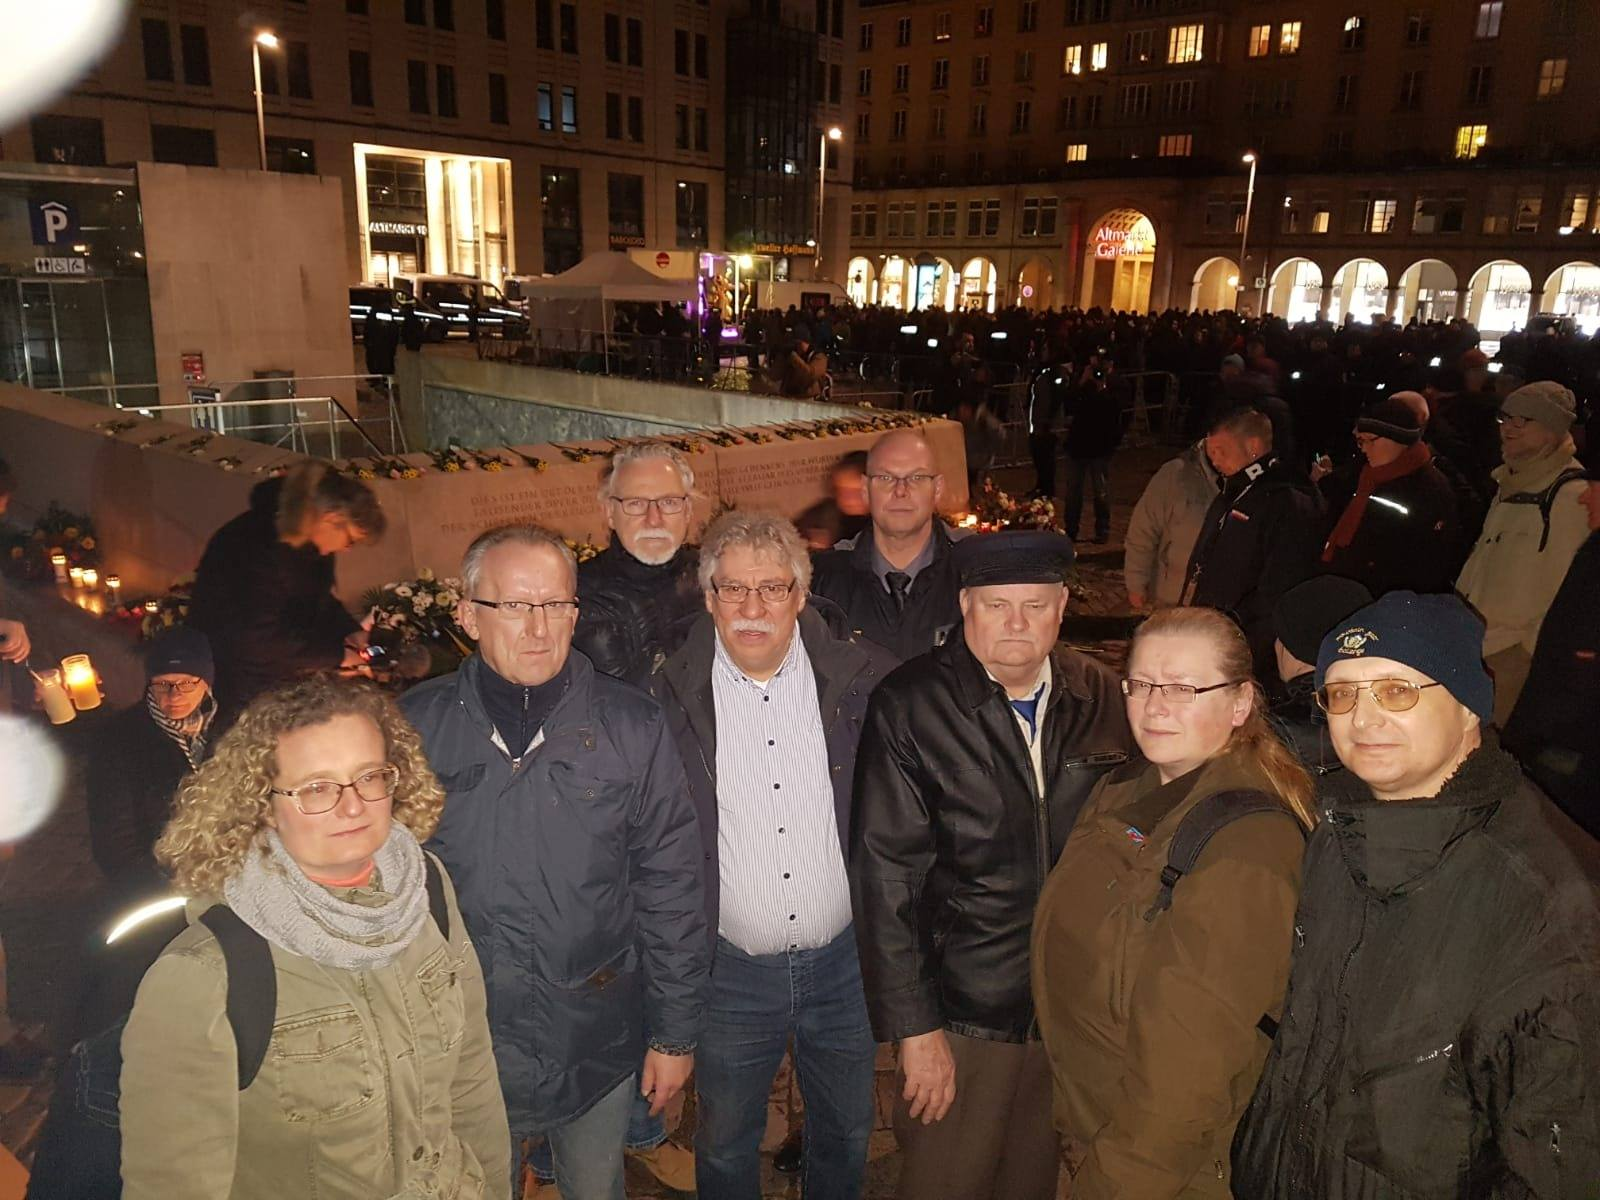 Gedenkfeier am 13.02.2020 in Dresden